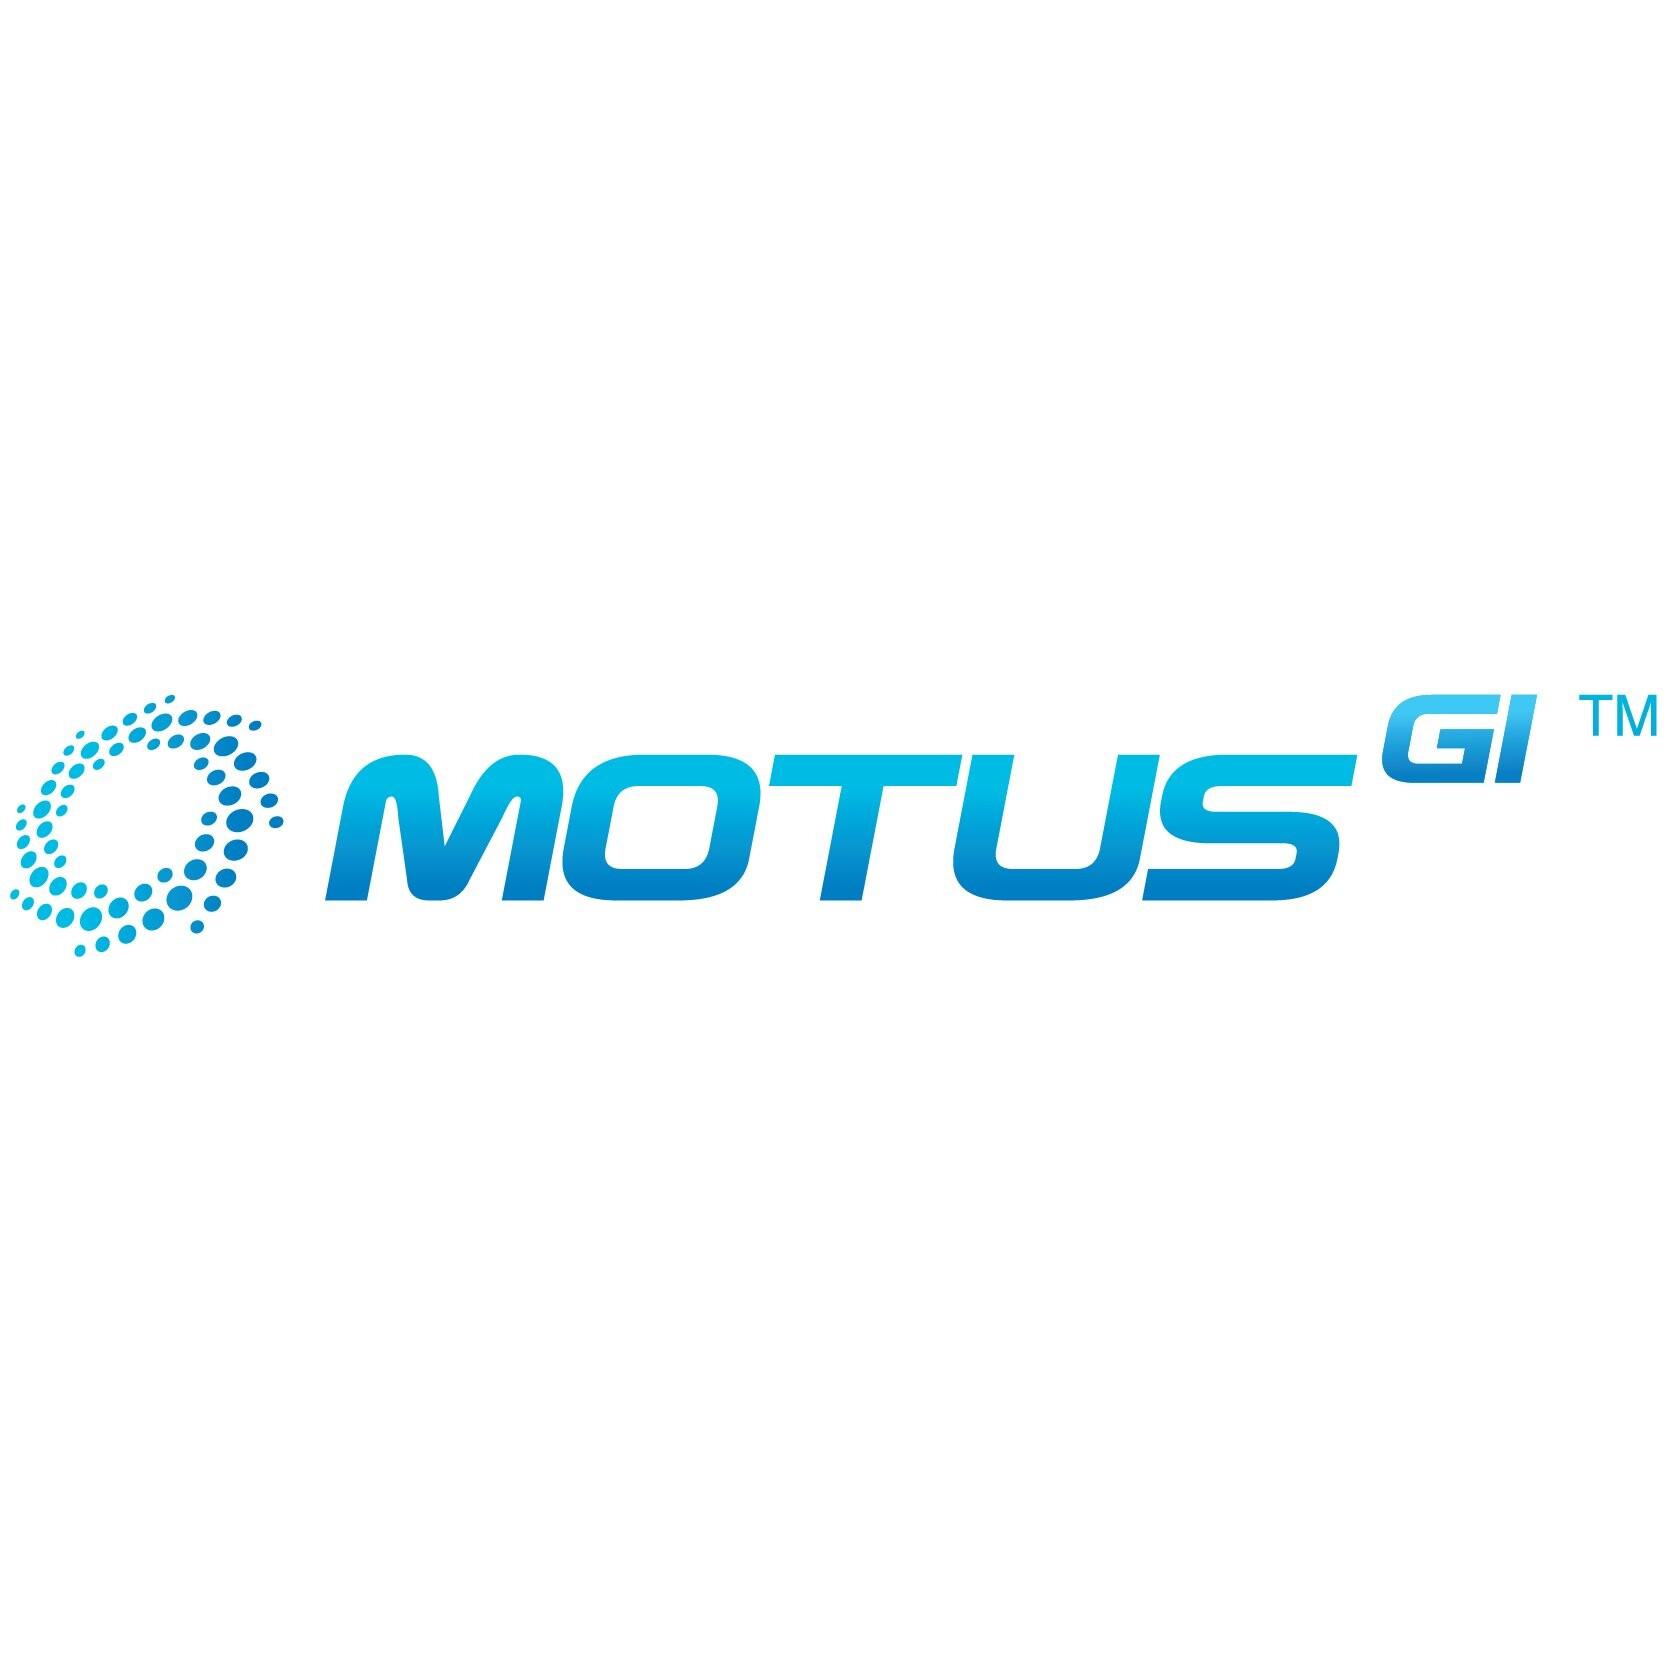 MOTUS GI